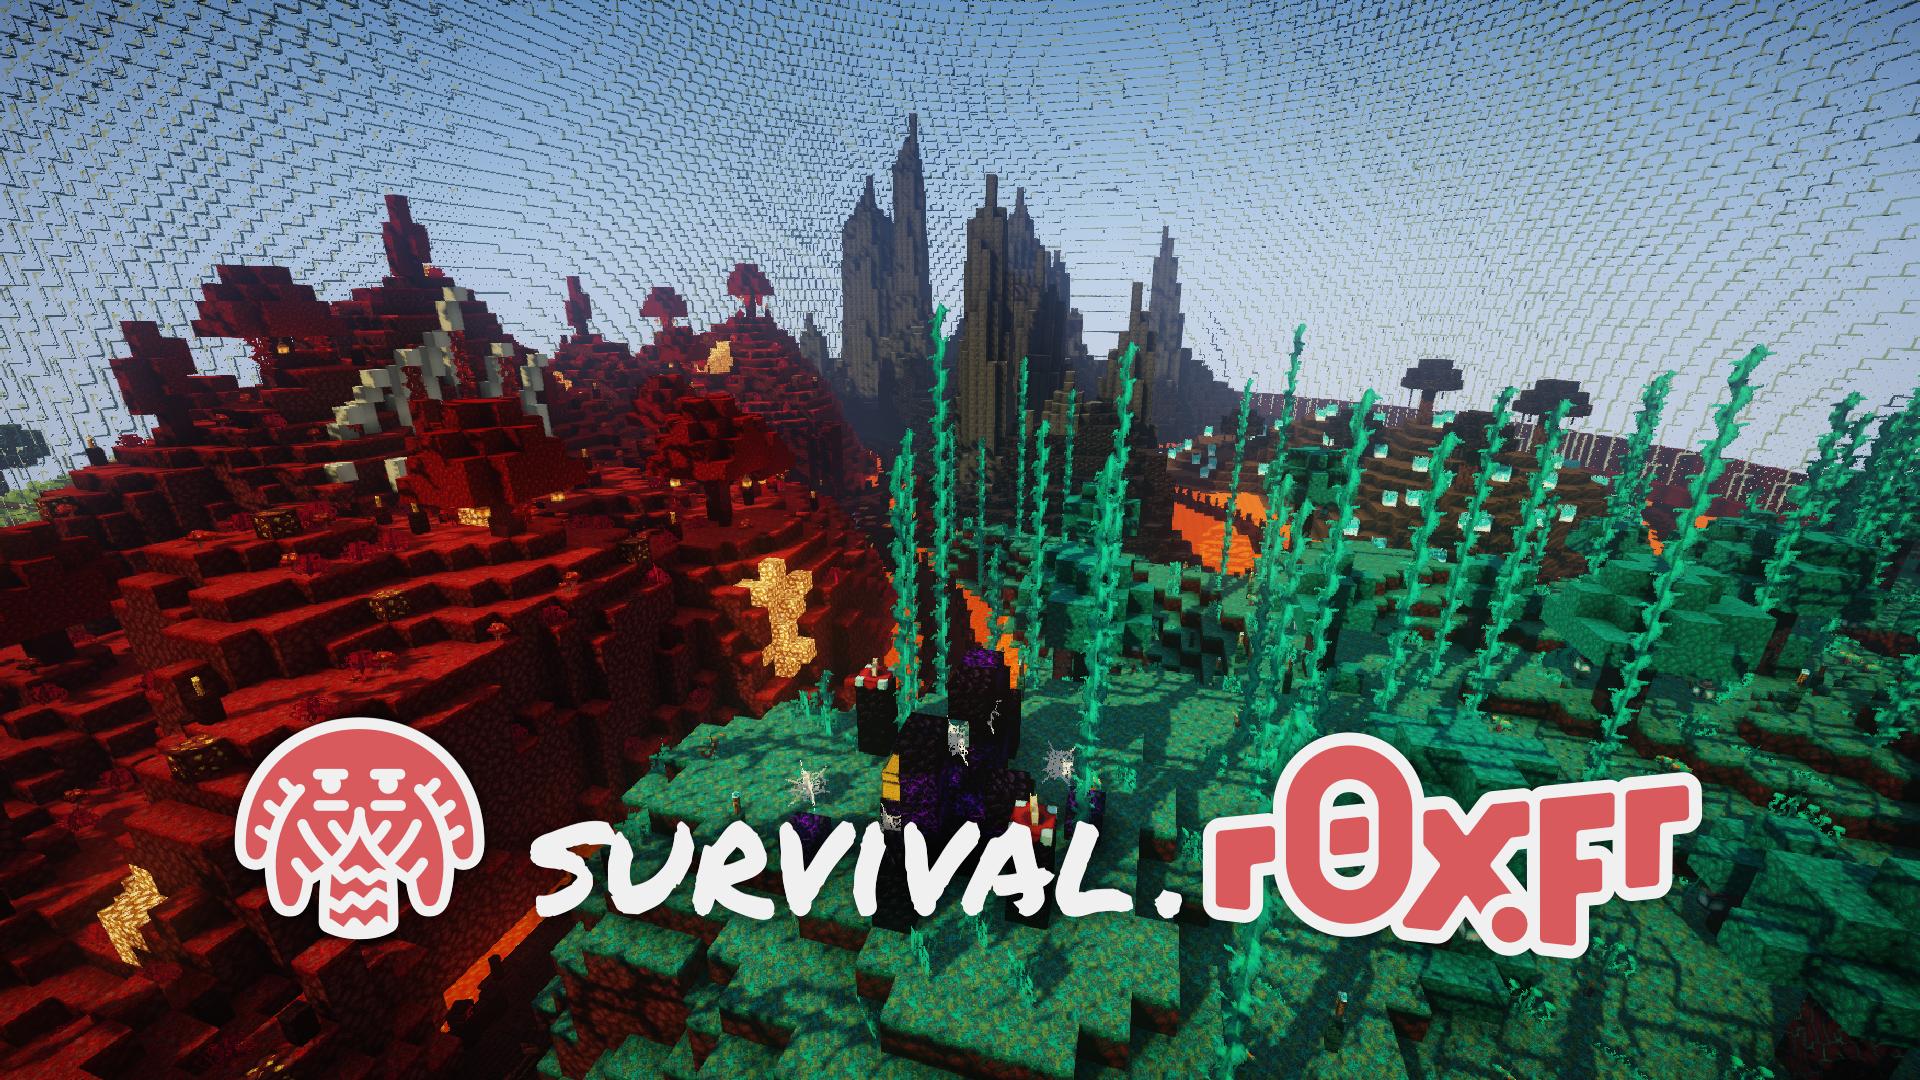 5f4e8151b3af0-ban_survival_1.16_1920x1080.png